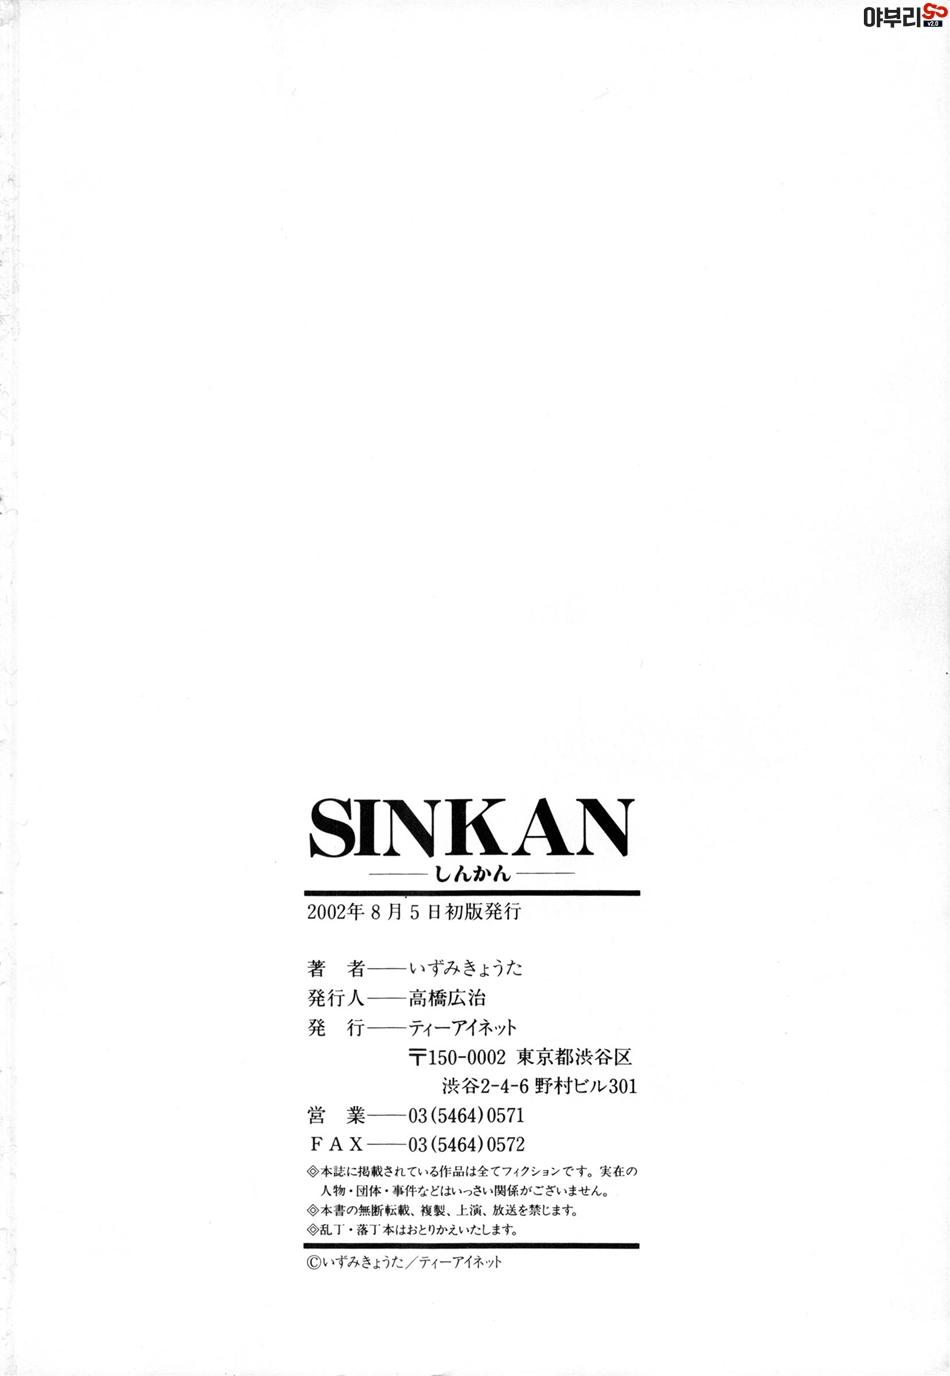 page_202.jpg